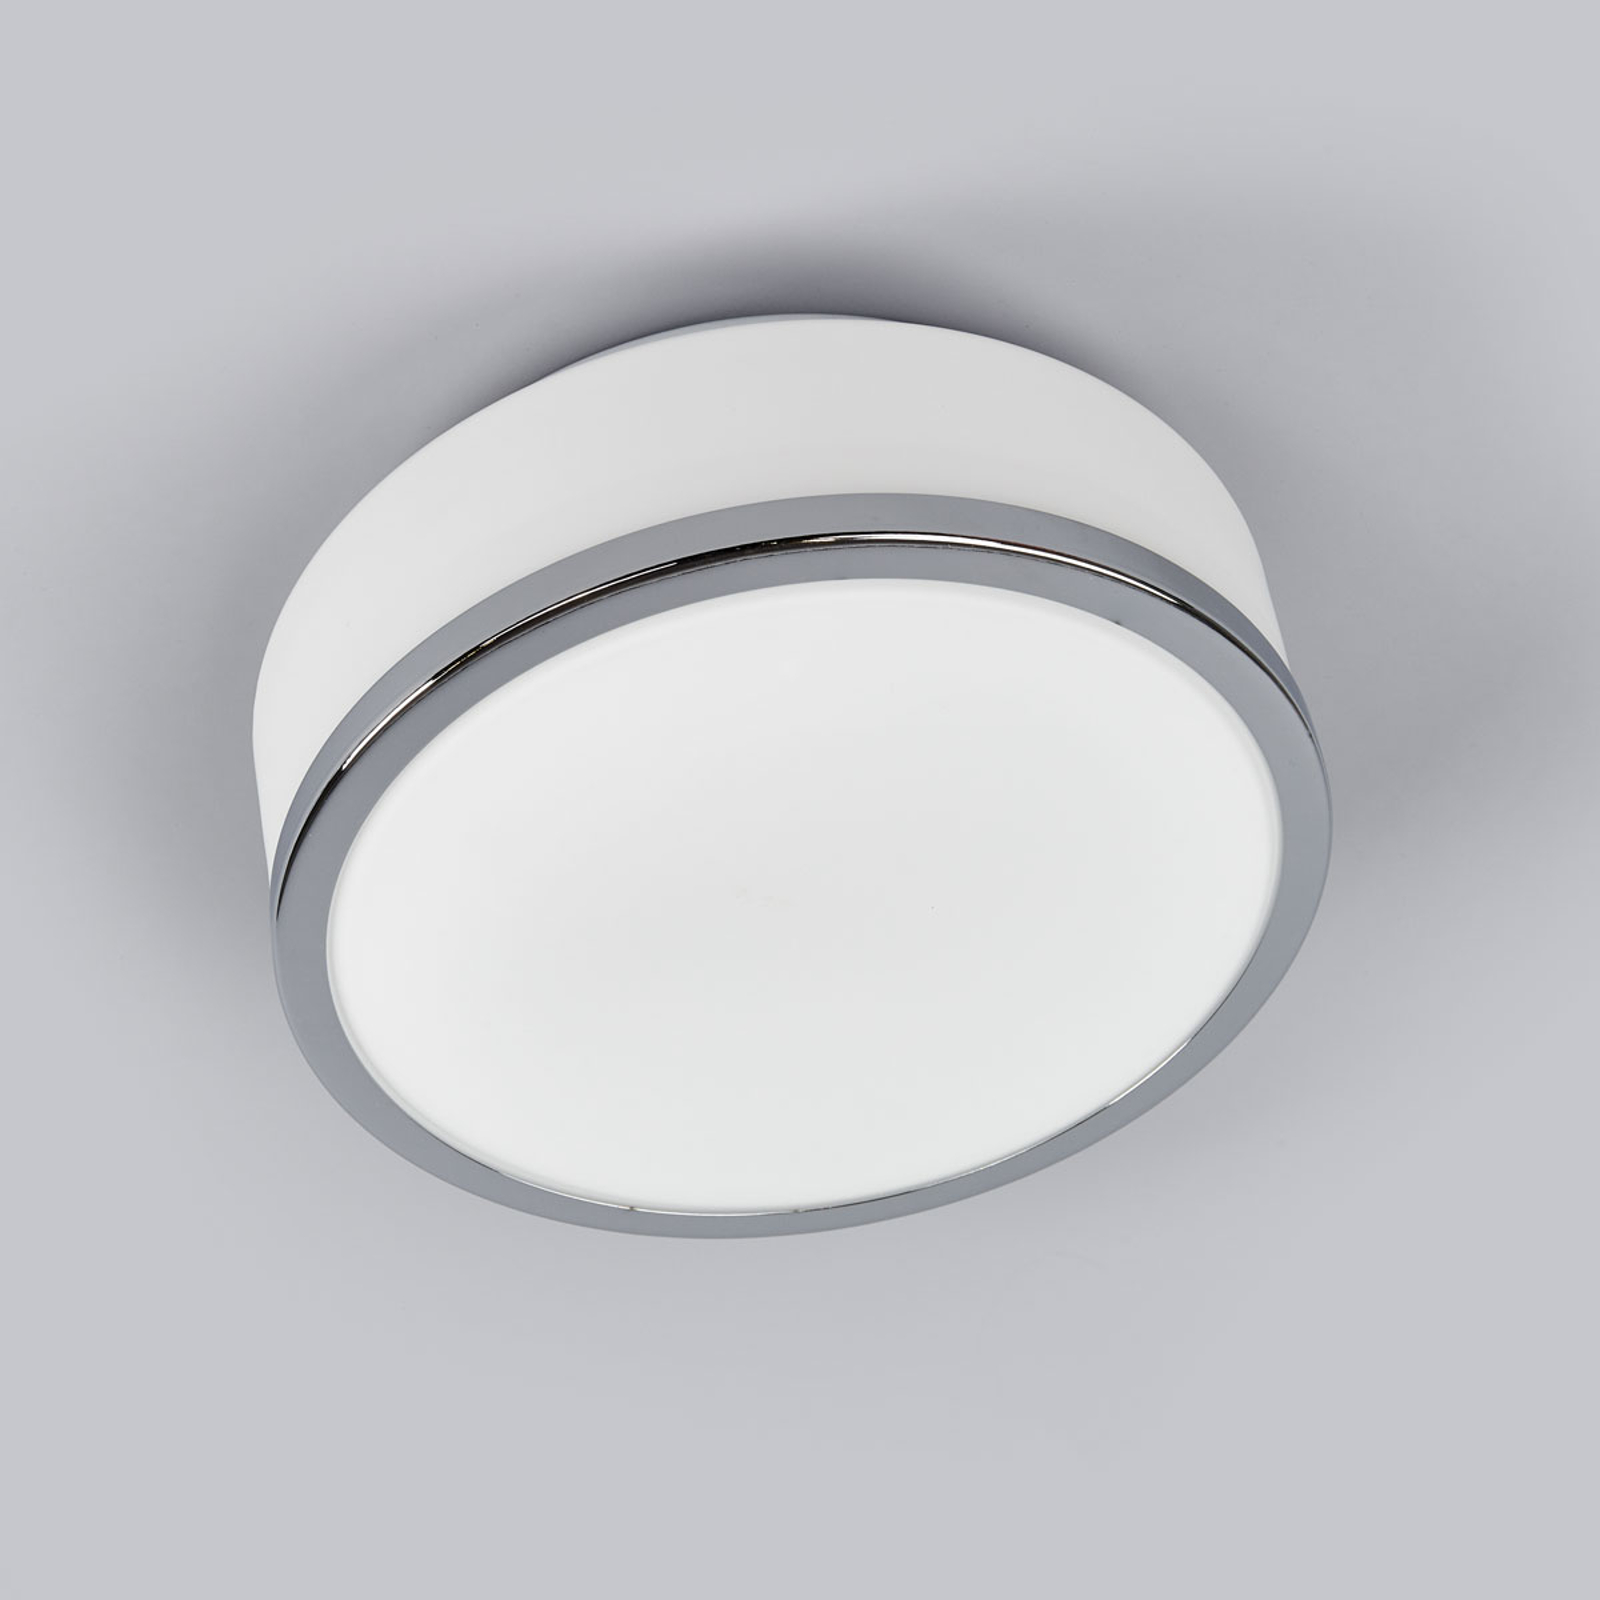 Lampa sufitowa Flush IP44, Ø 23 cm, chrom